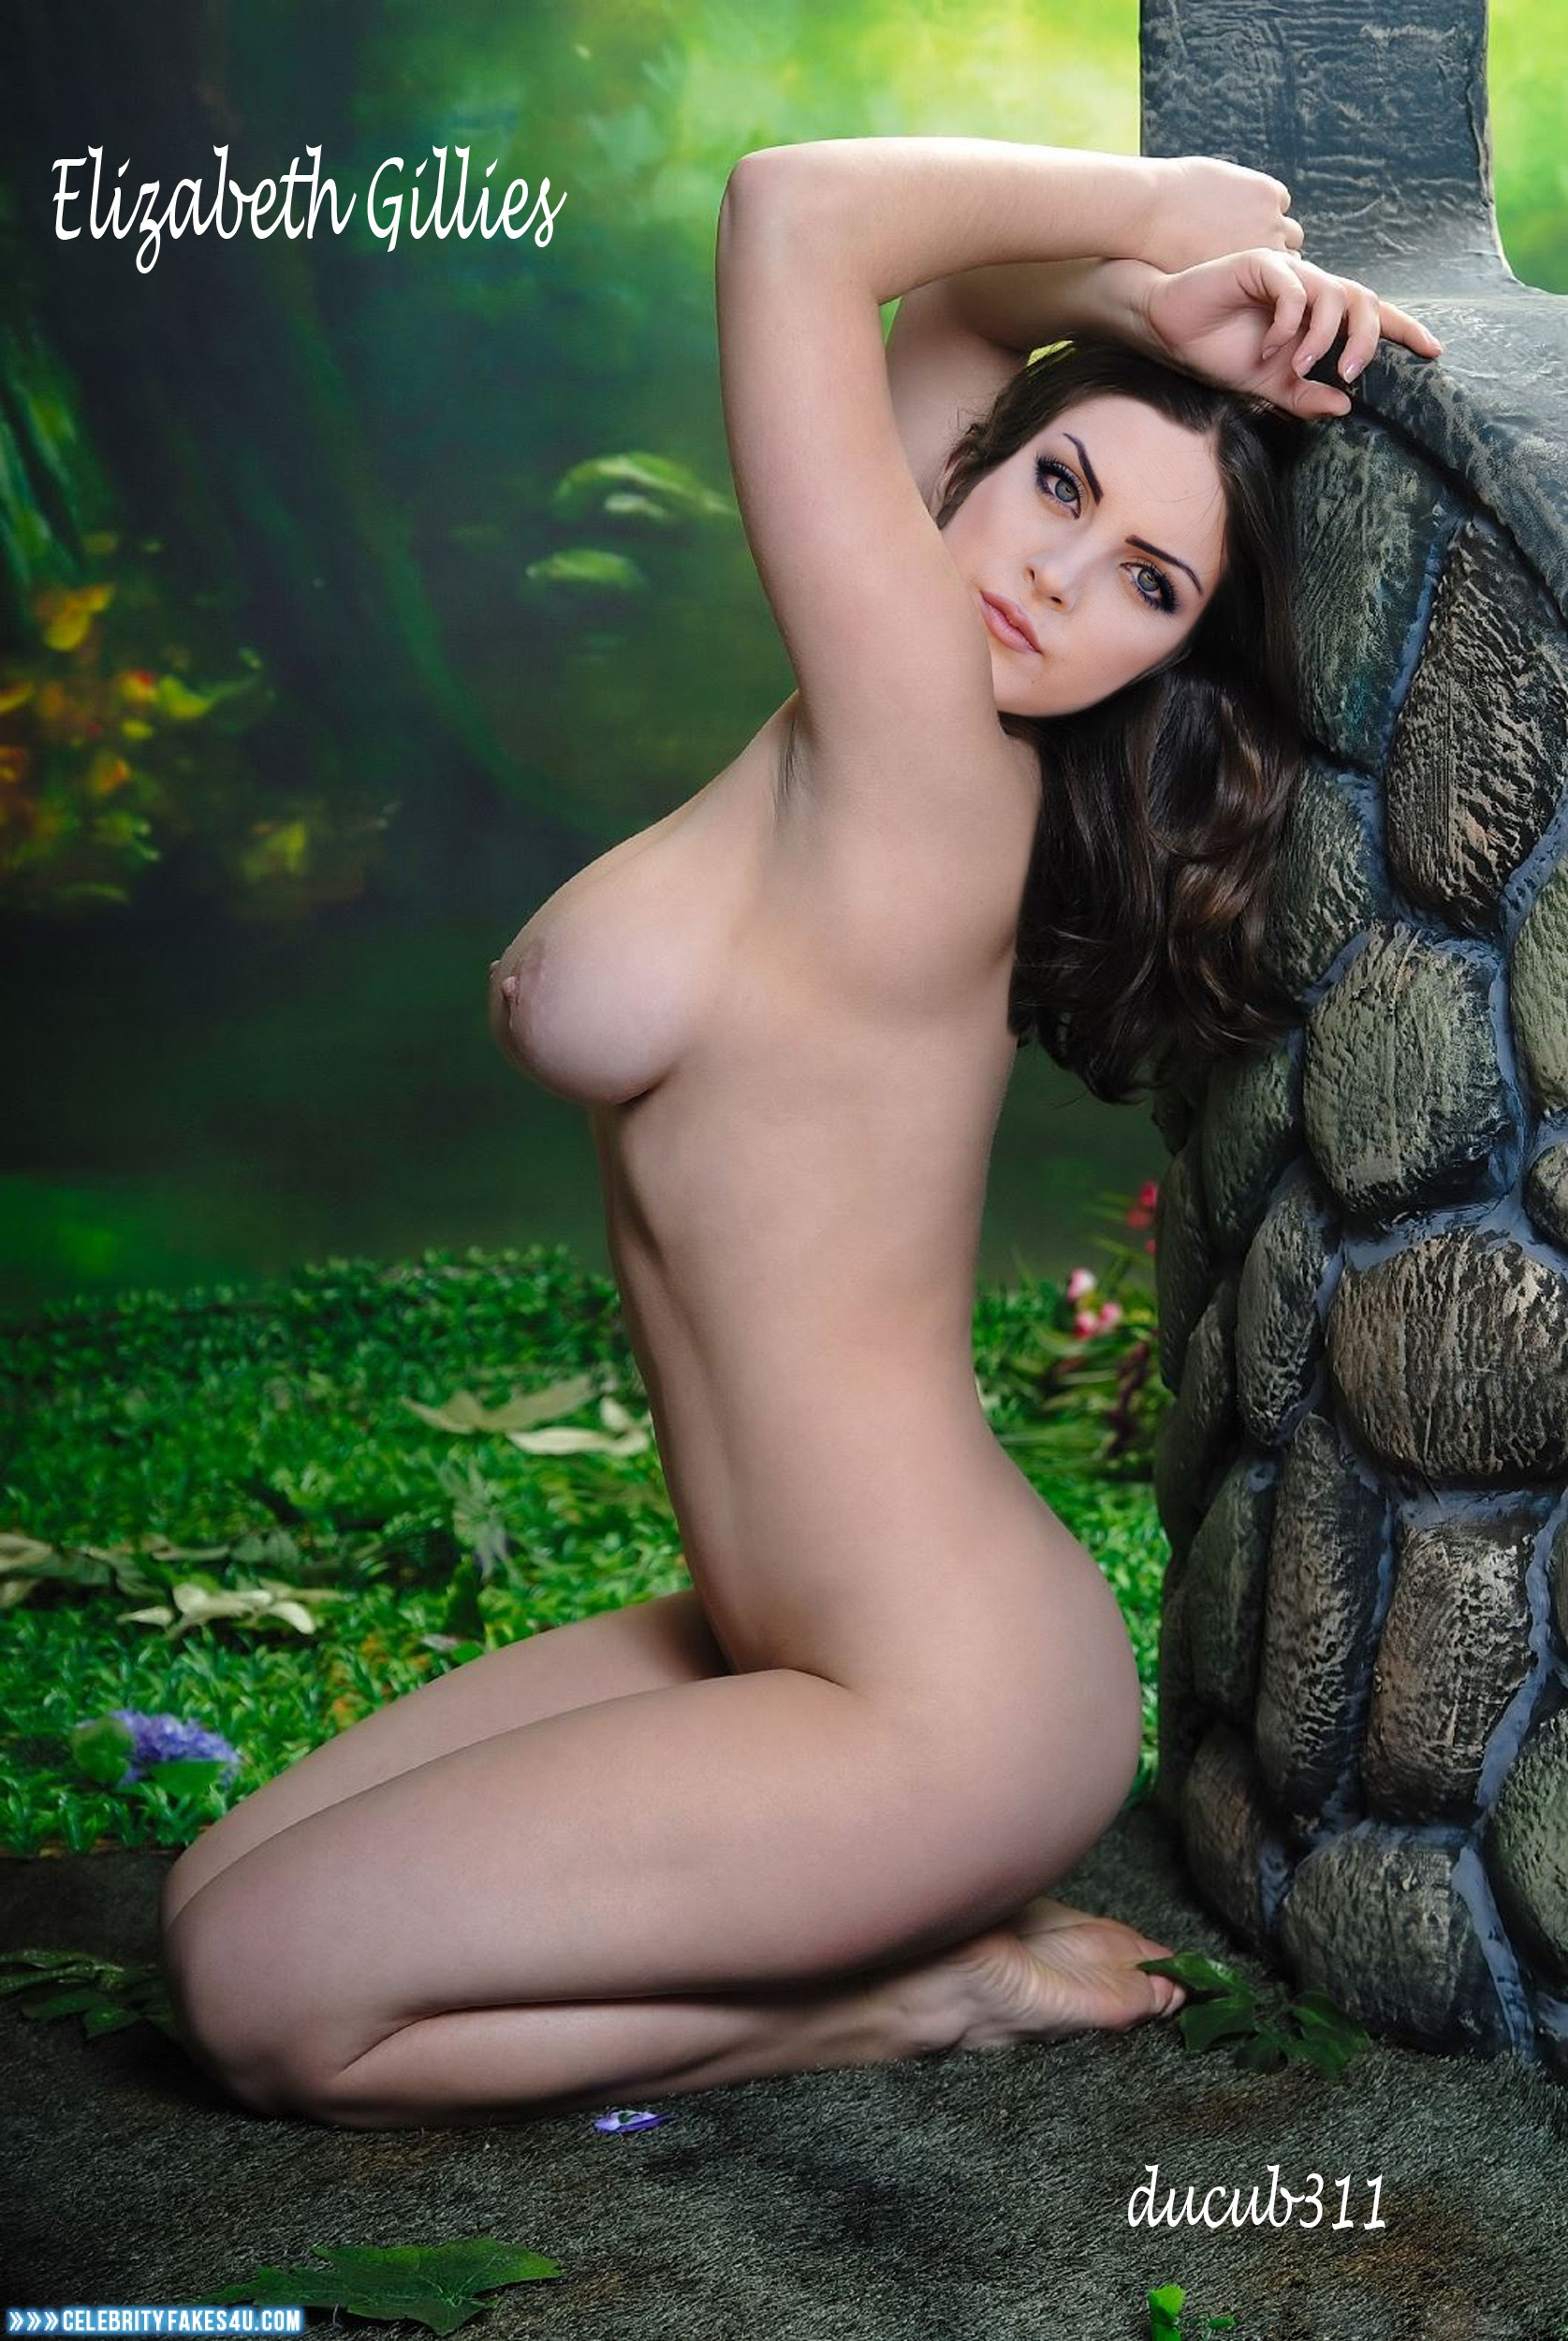 elizabeth gillies naked